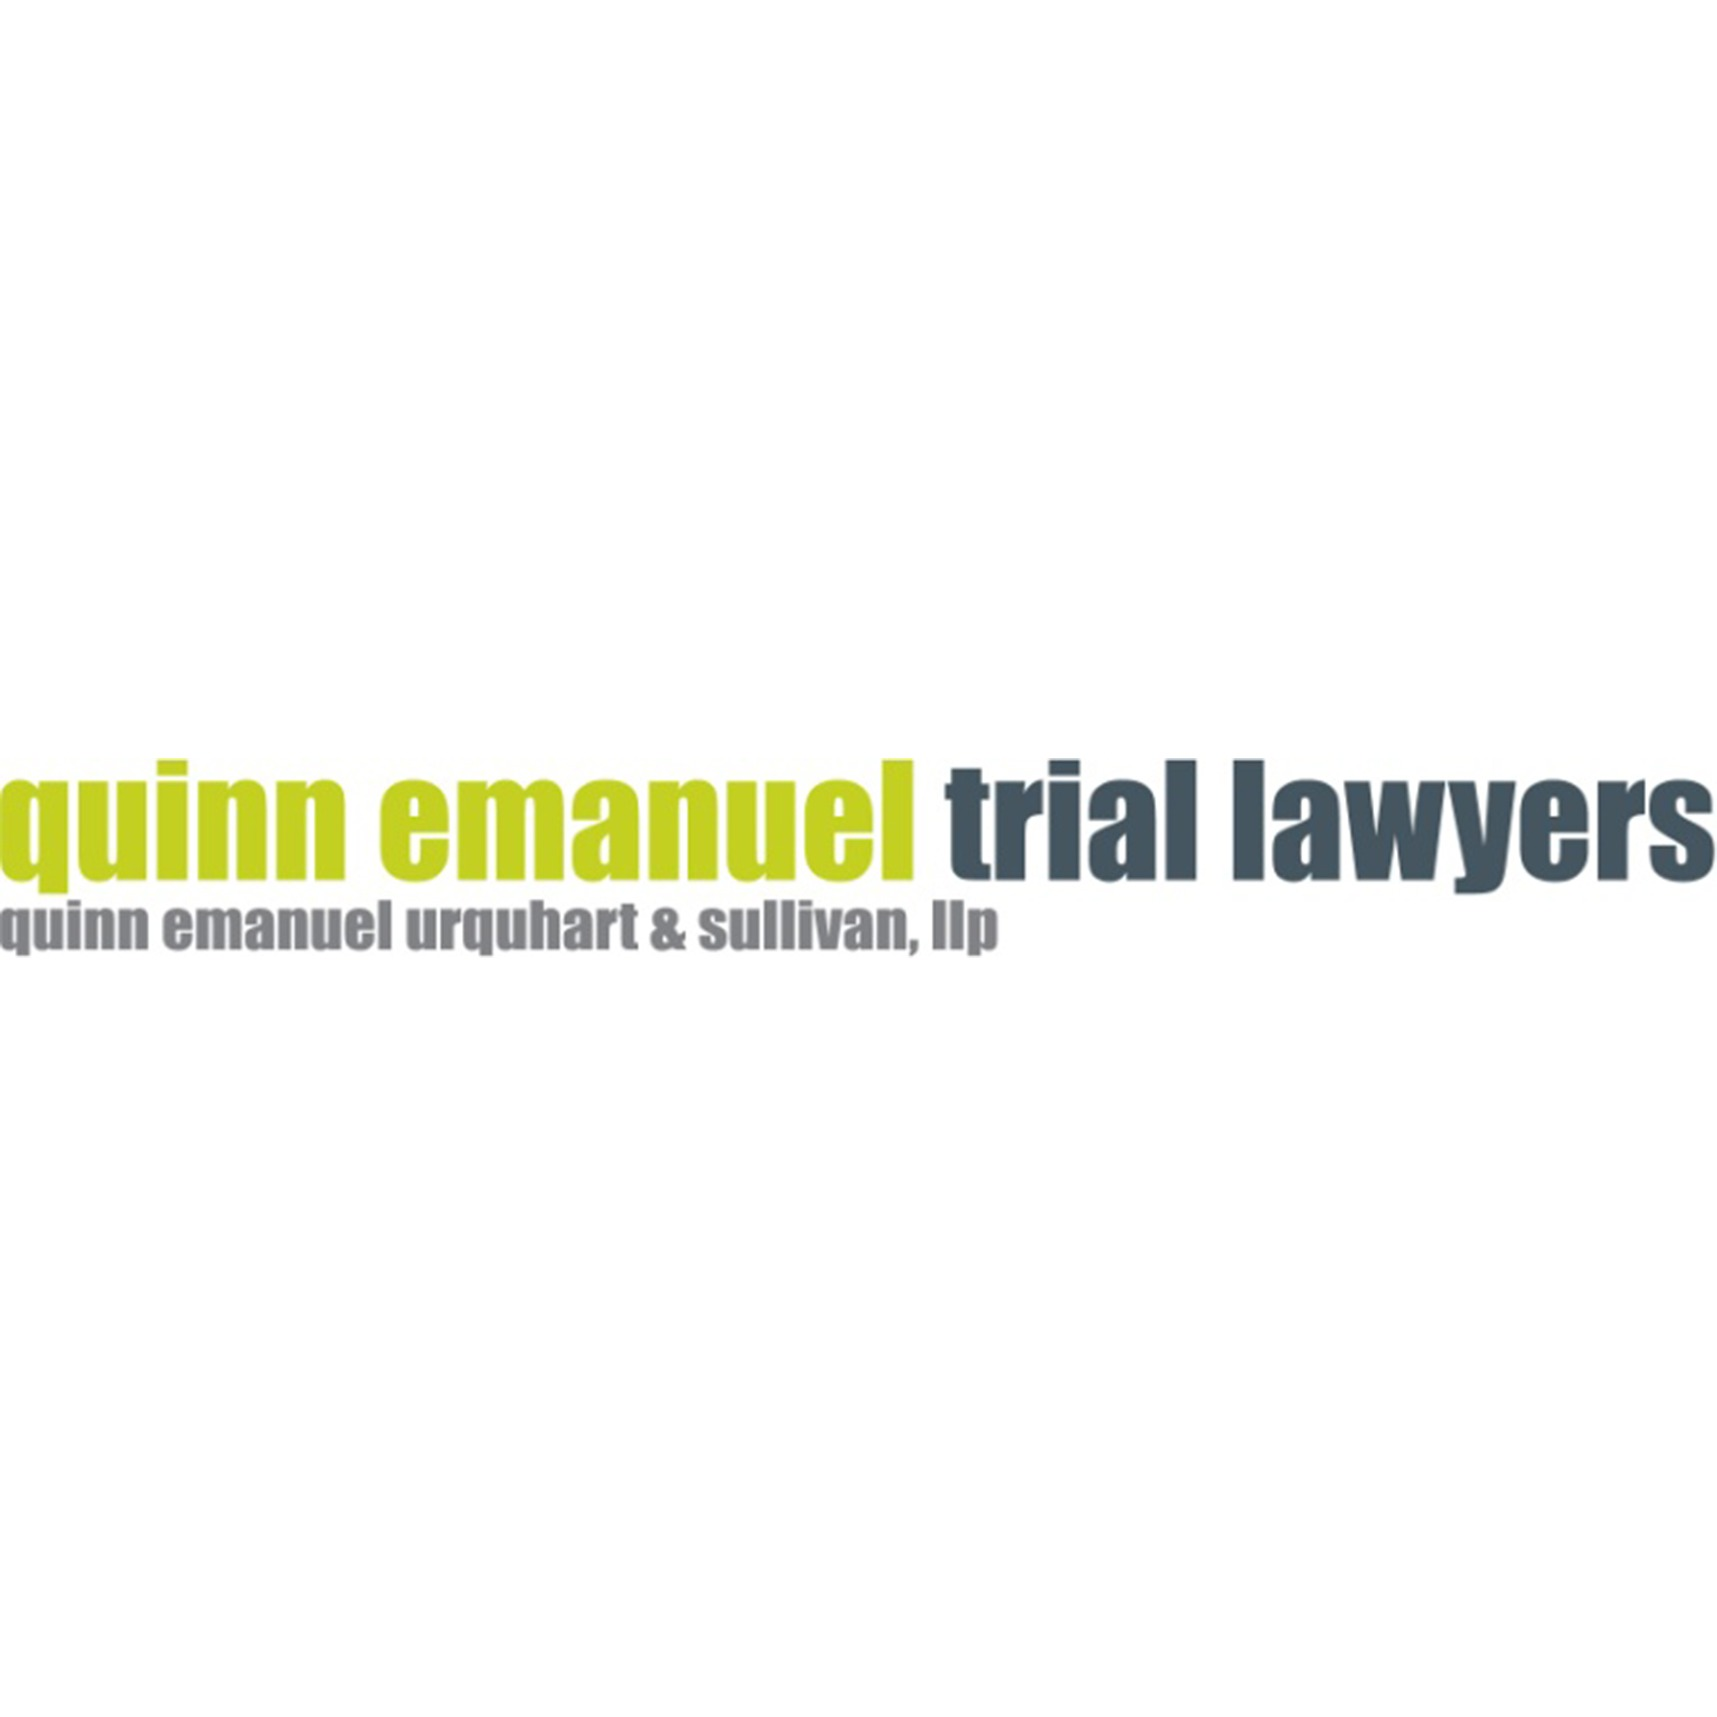 the Quinn Emanuel Urquhart & Sullivan logo.